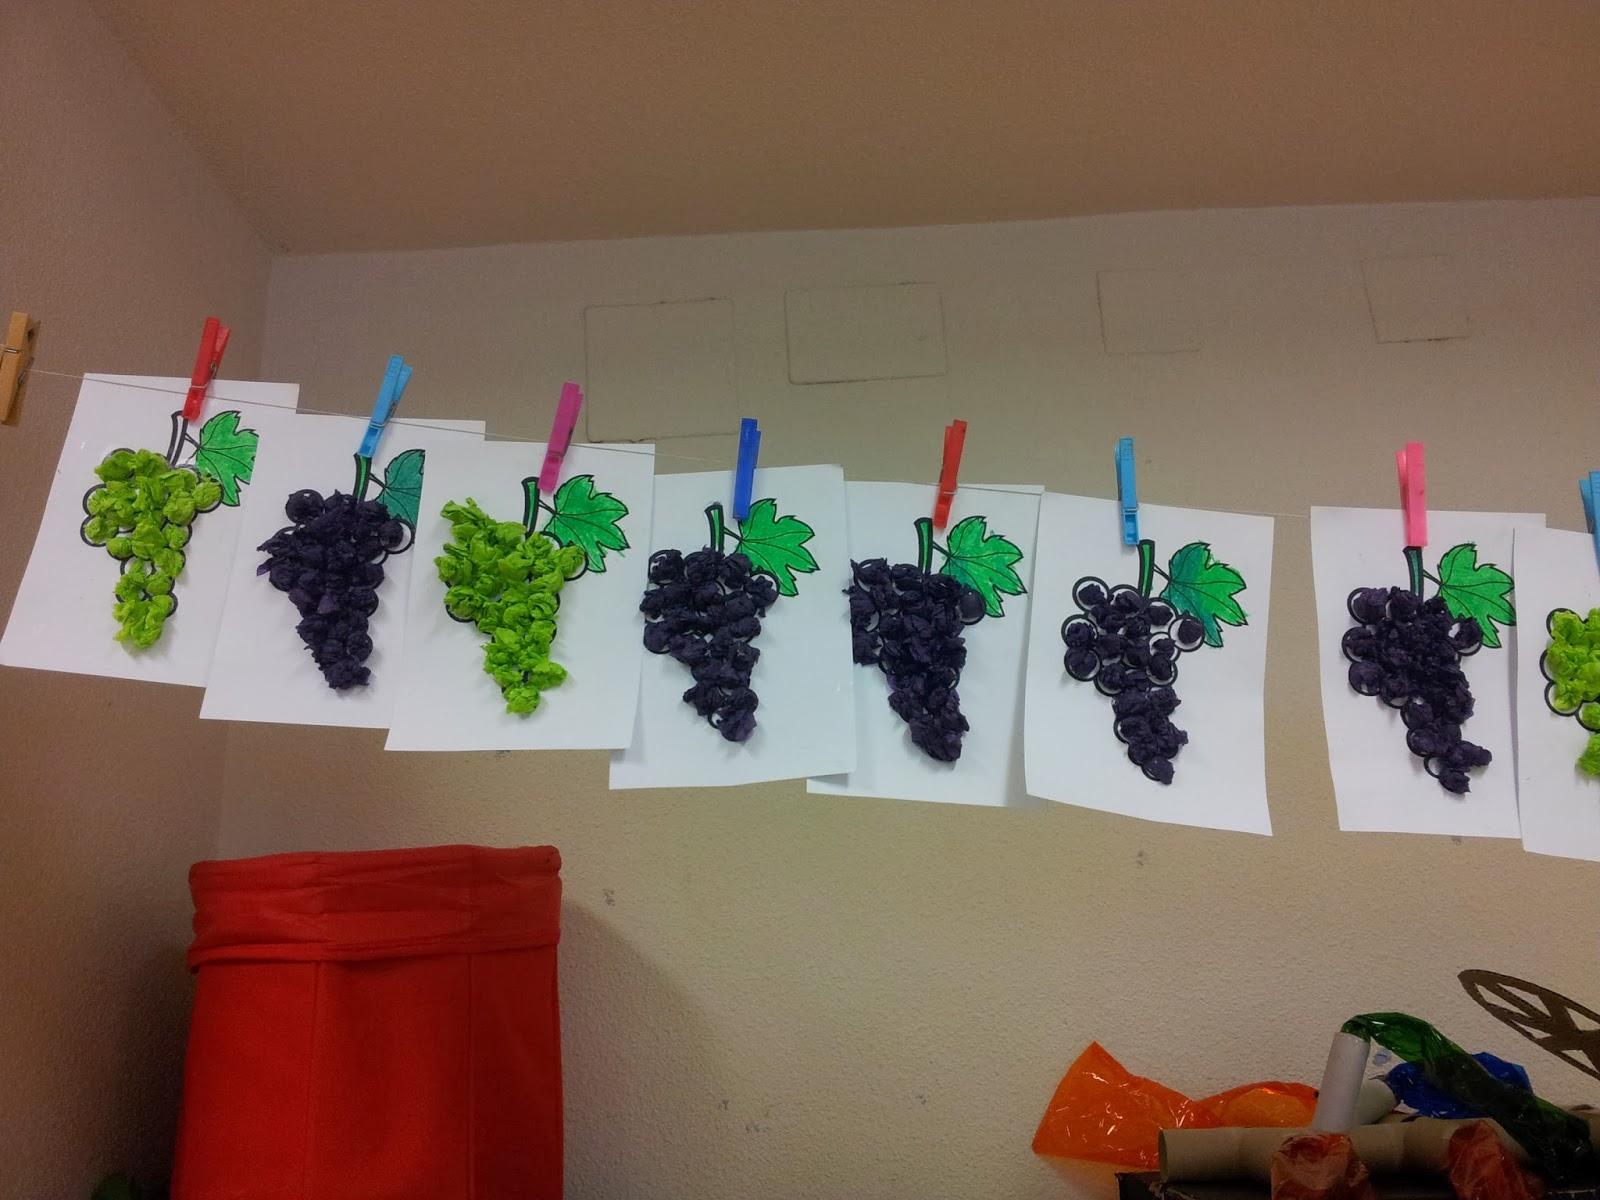 Tercero Infantil - Lorenzo Goicoa: Actividad 1 - Racimo de uva